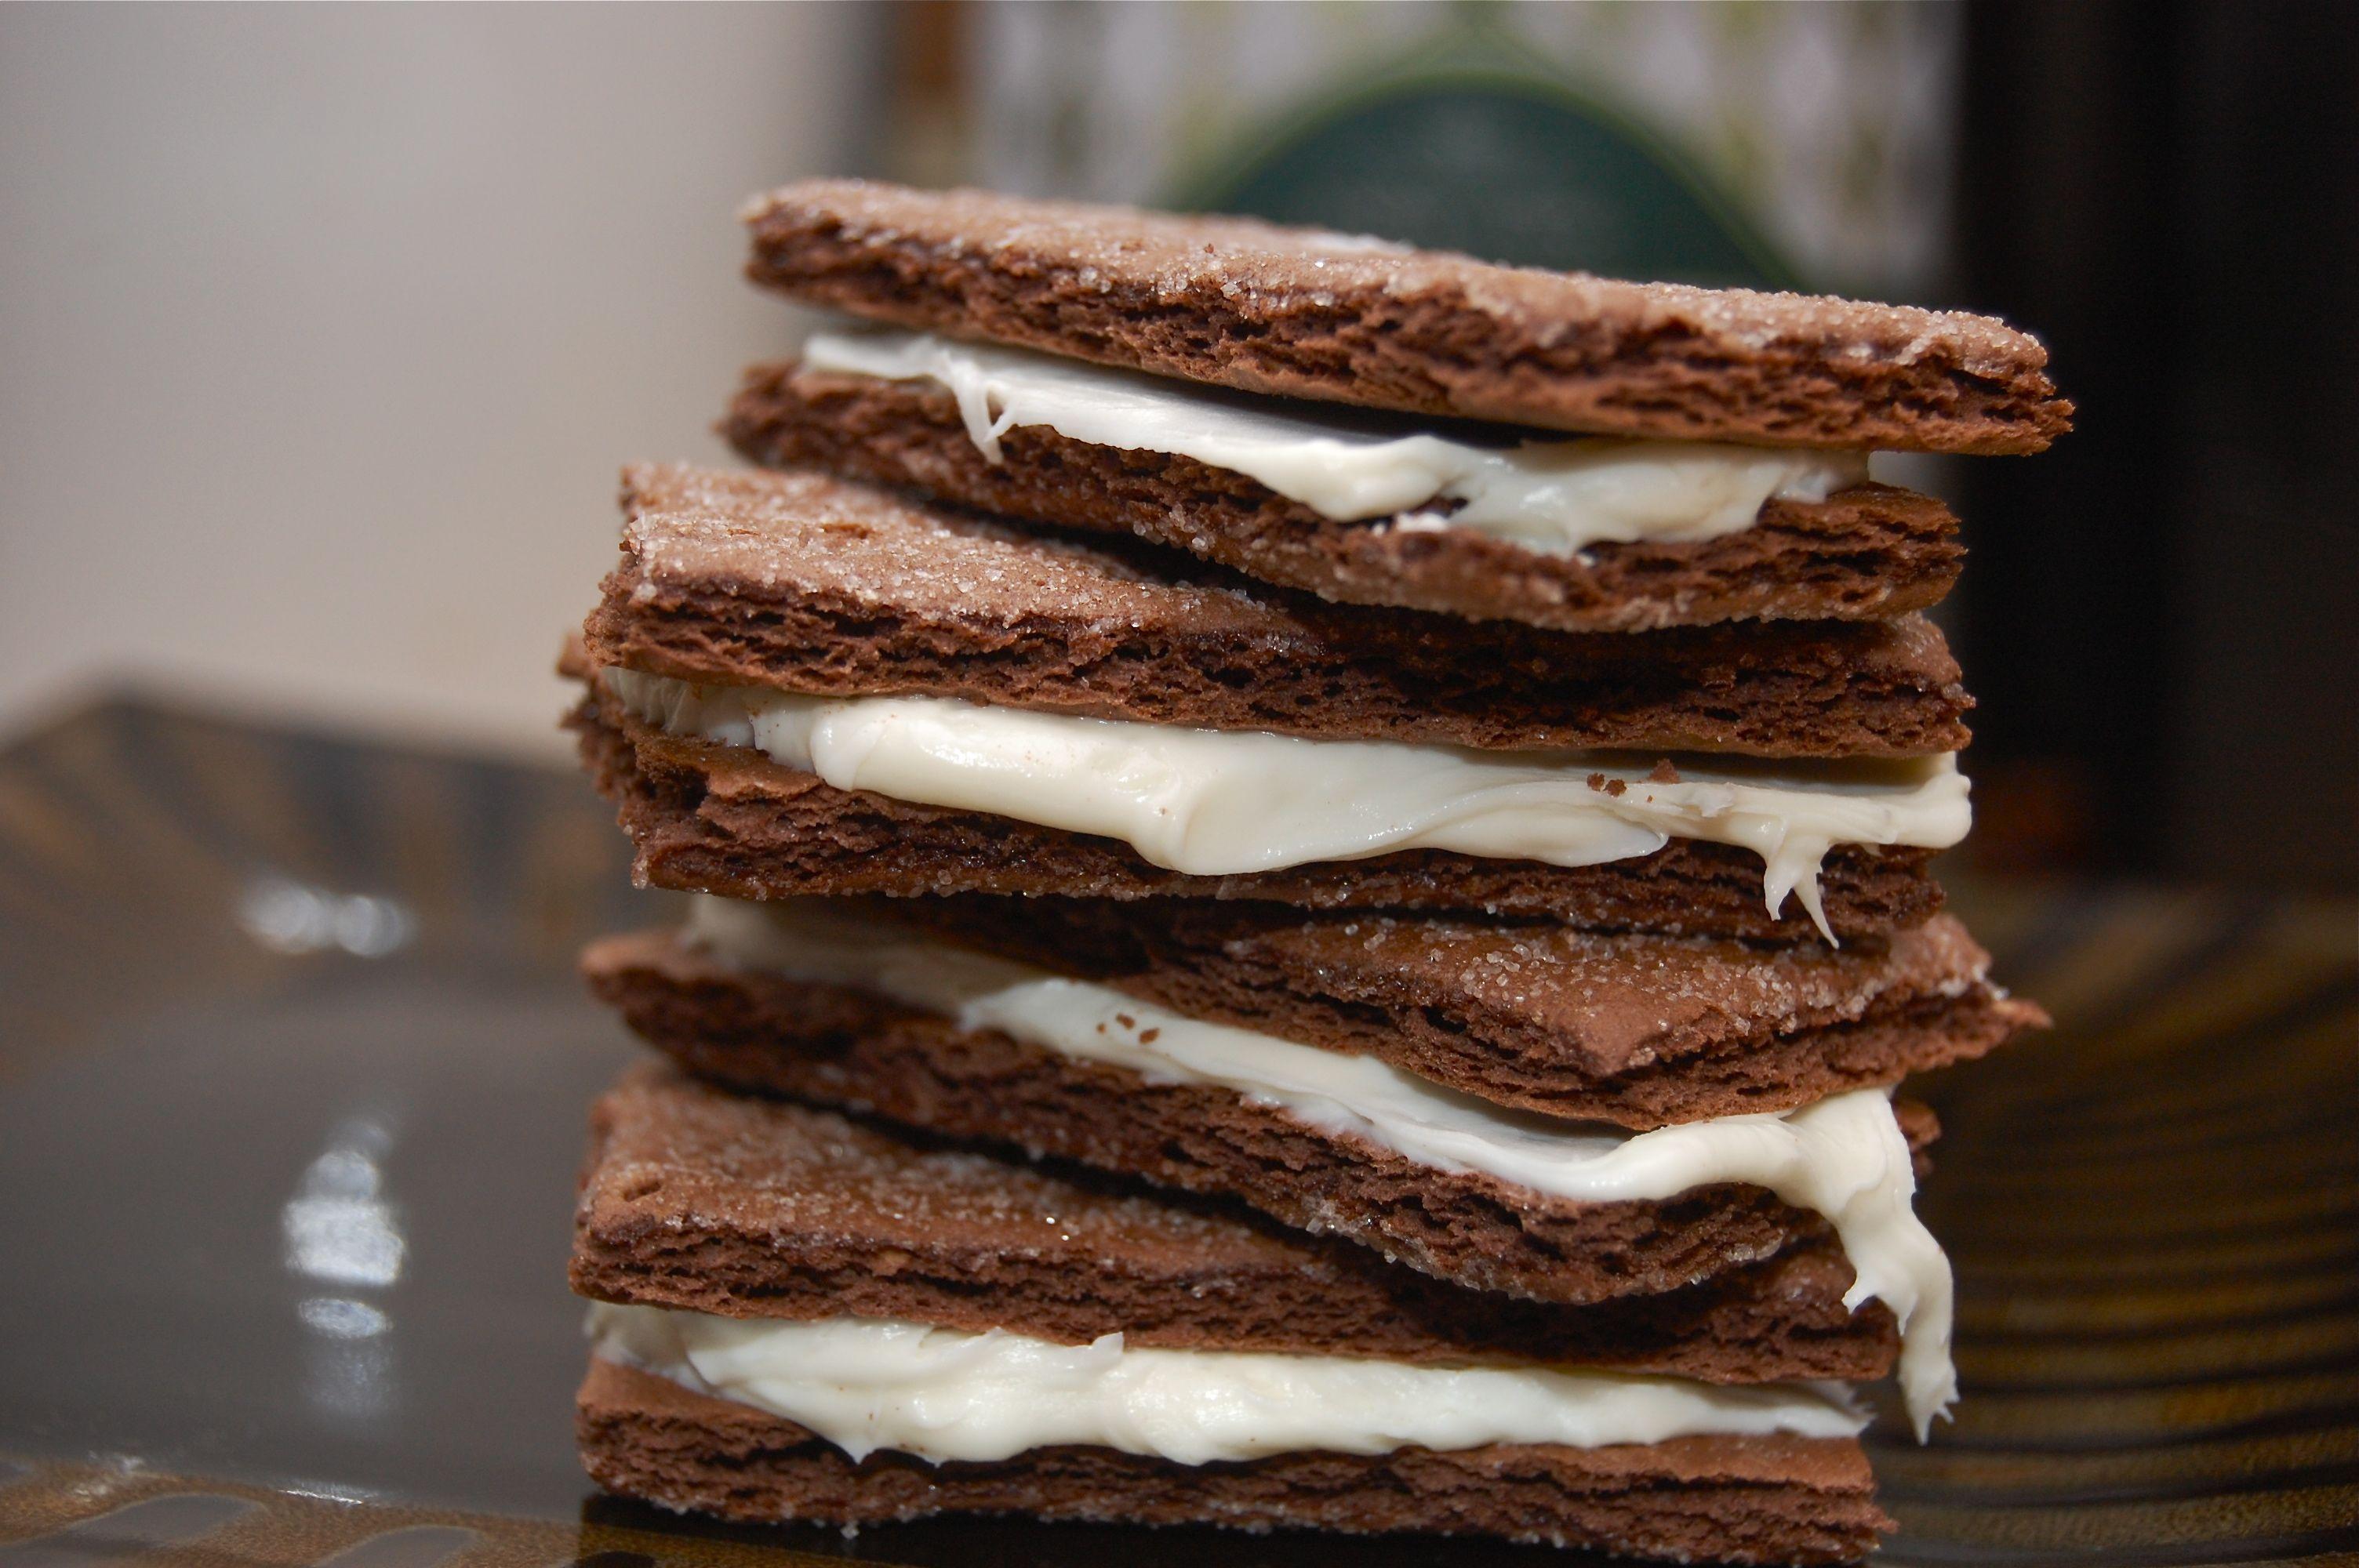 Cheap Oreo Imitations Chocolate Graham Crackers Easy Snacks Cream Cheese Cookies